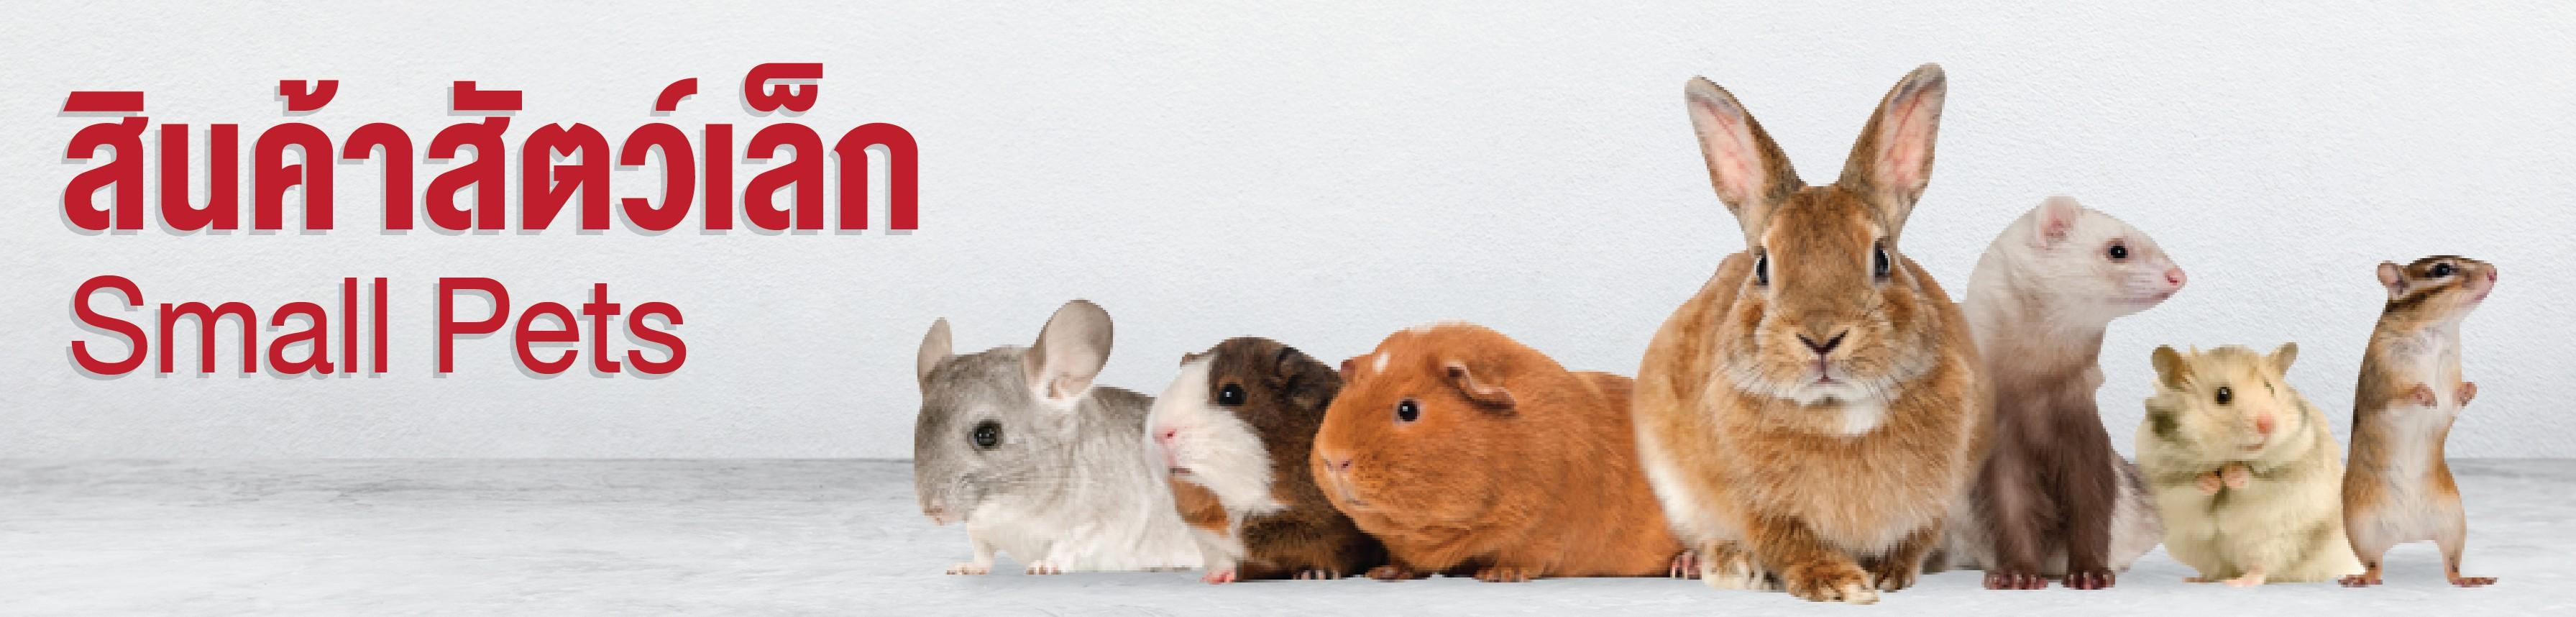 small pets